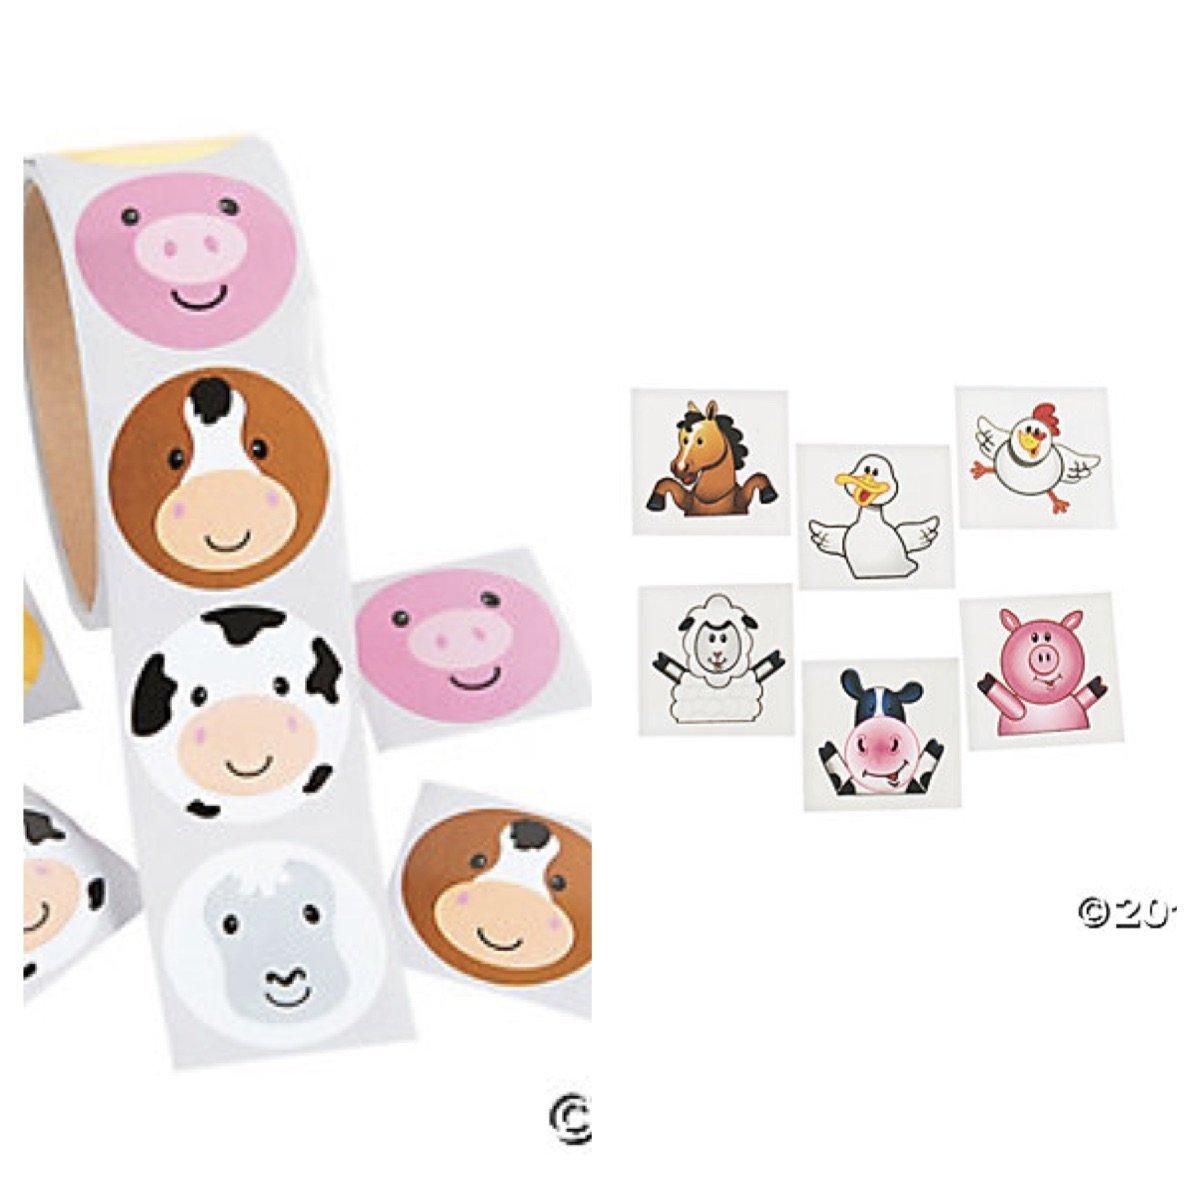 344 pce. Adorable Farm Party Favors/200 FARM ANIMAL Face STICKERS & 144 Farm Animal TATTOOS - COWS Pigs DUCKS - Daycare - DOCTOR - Classroom - Teachers